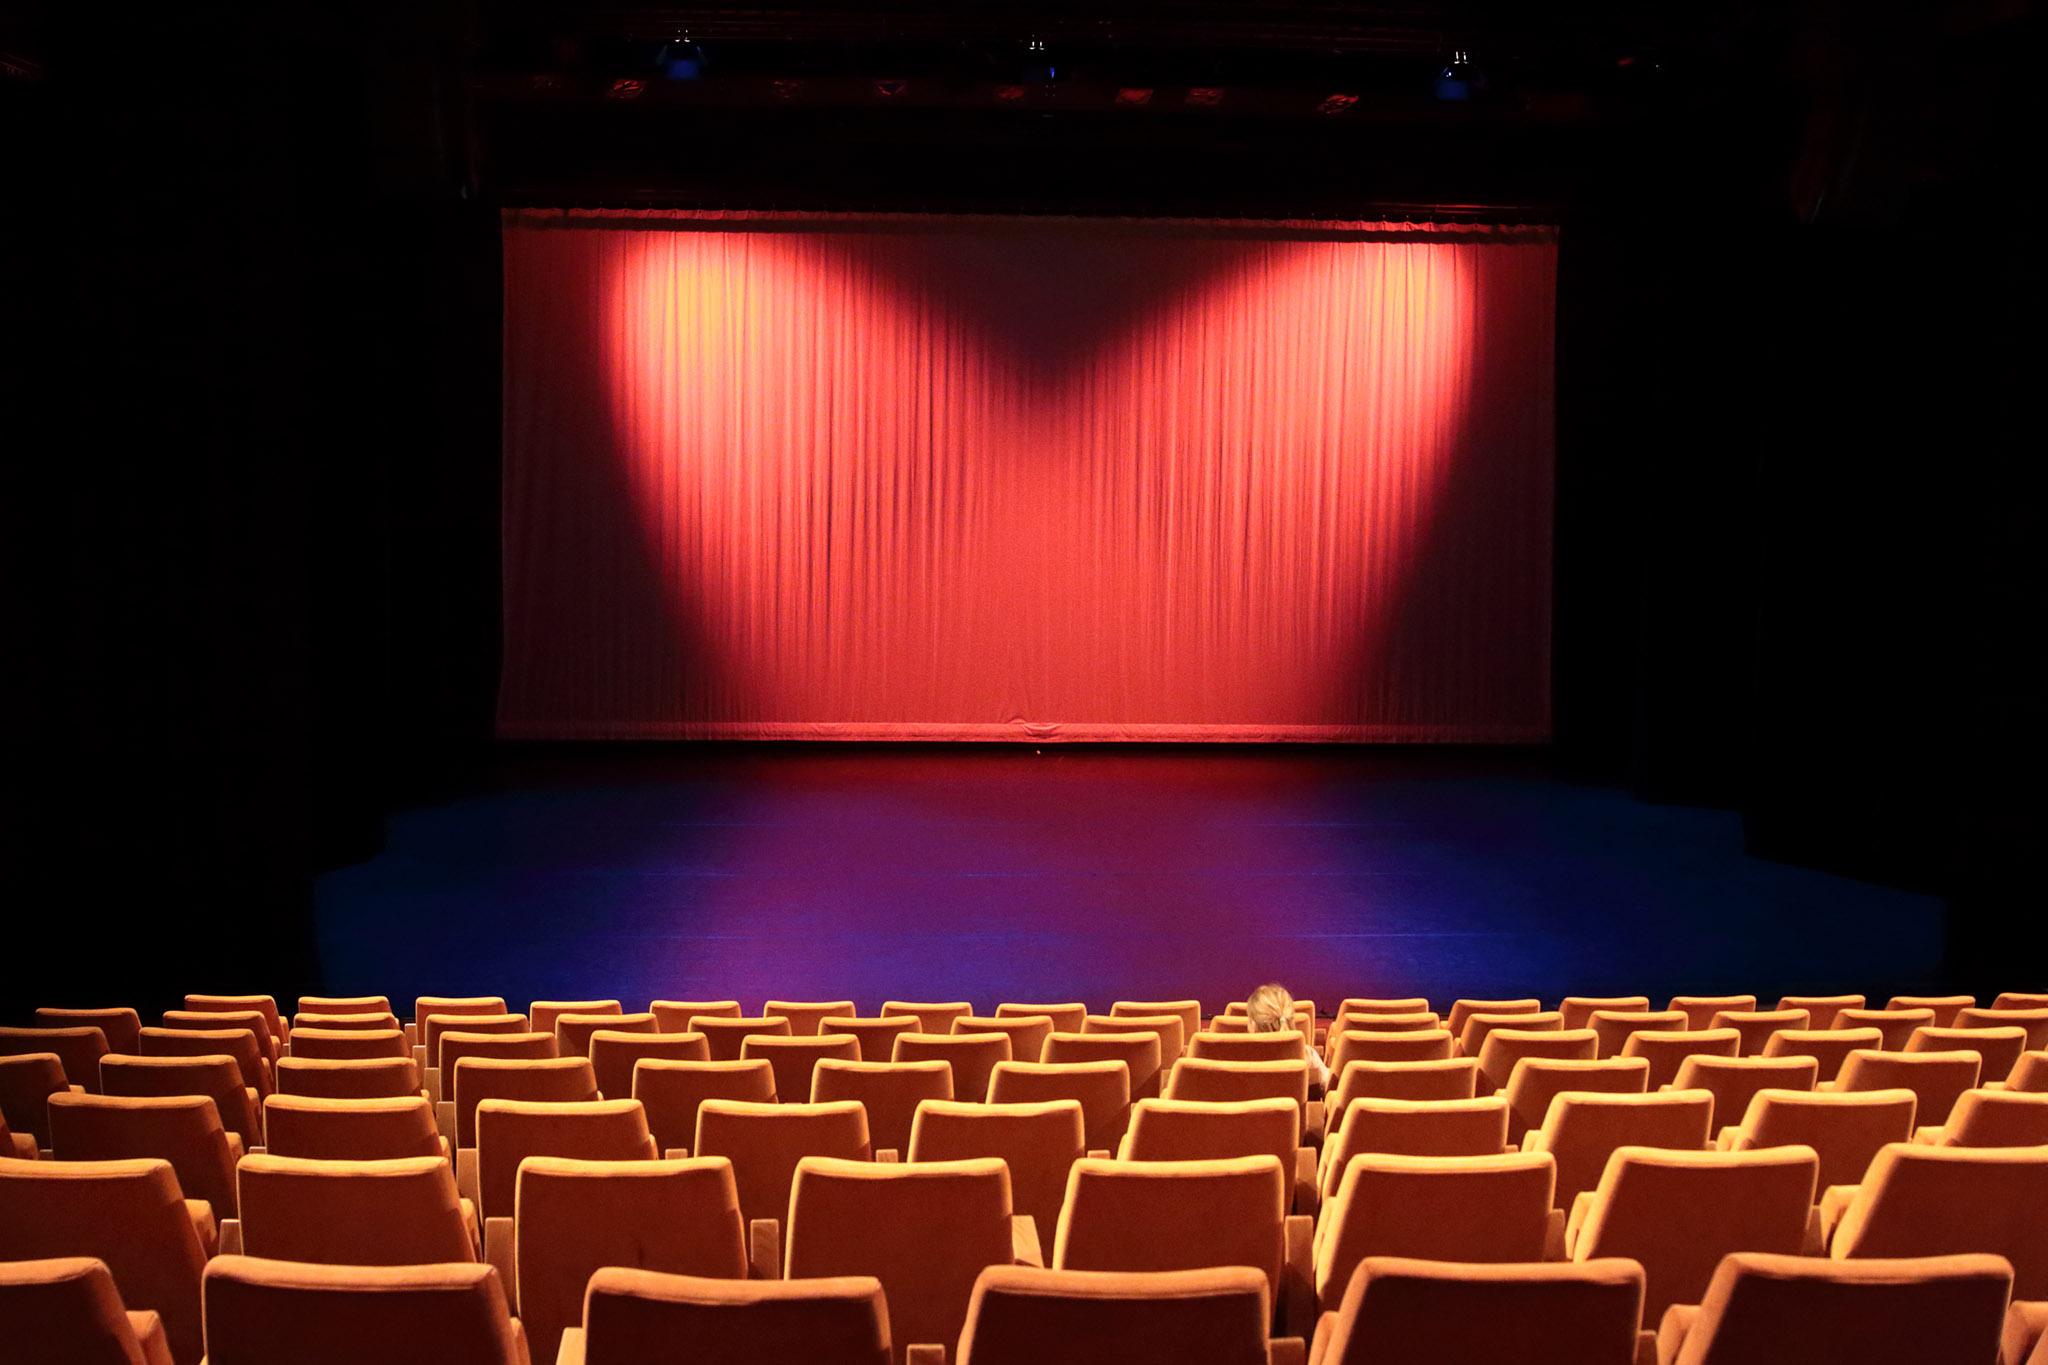 ZIMIHC theater bedrijfsfotografie Zuilen podium